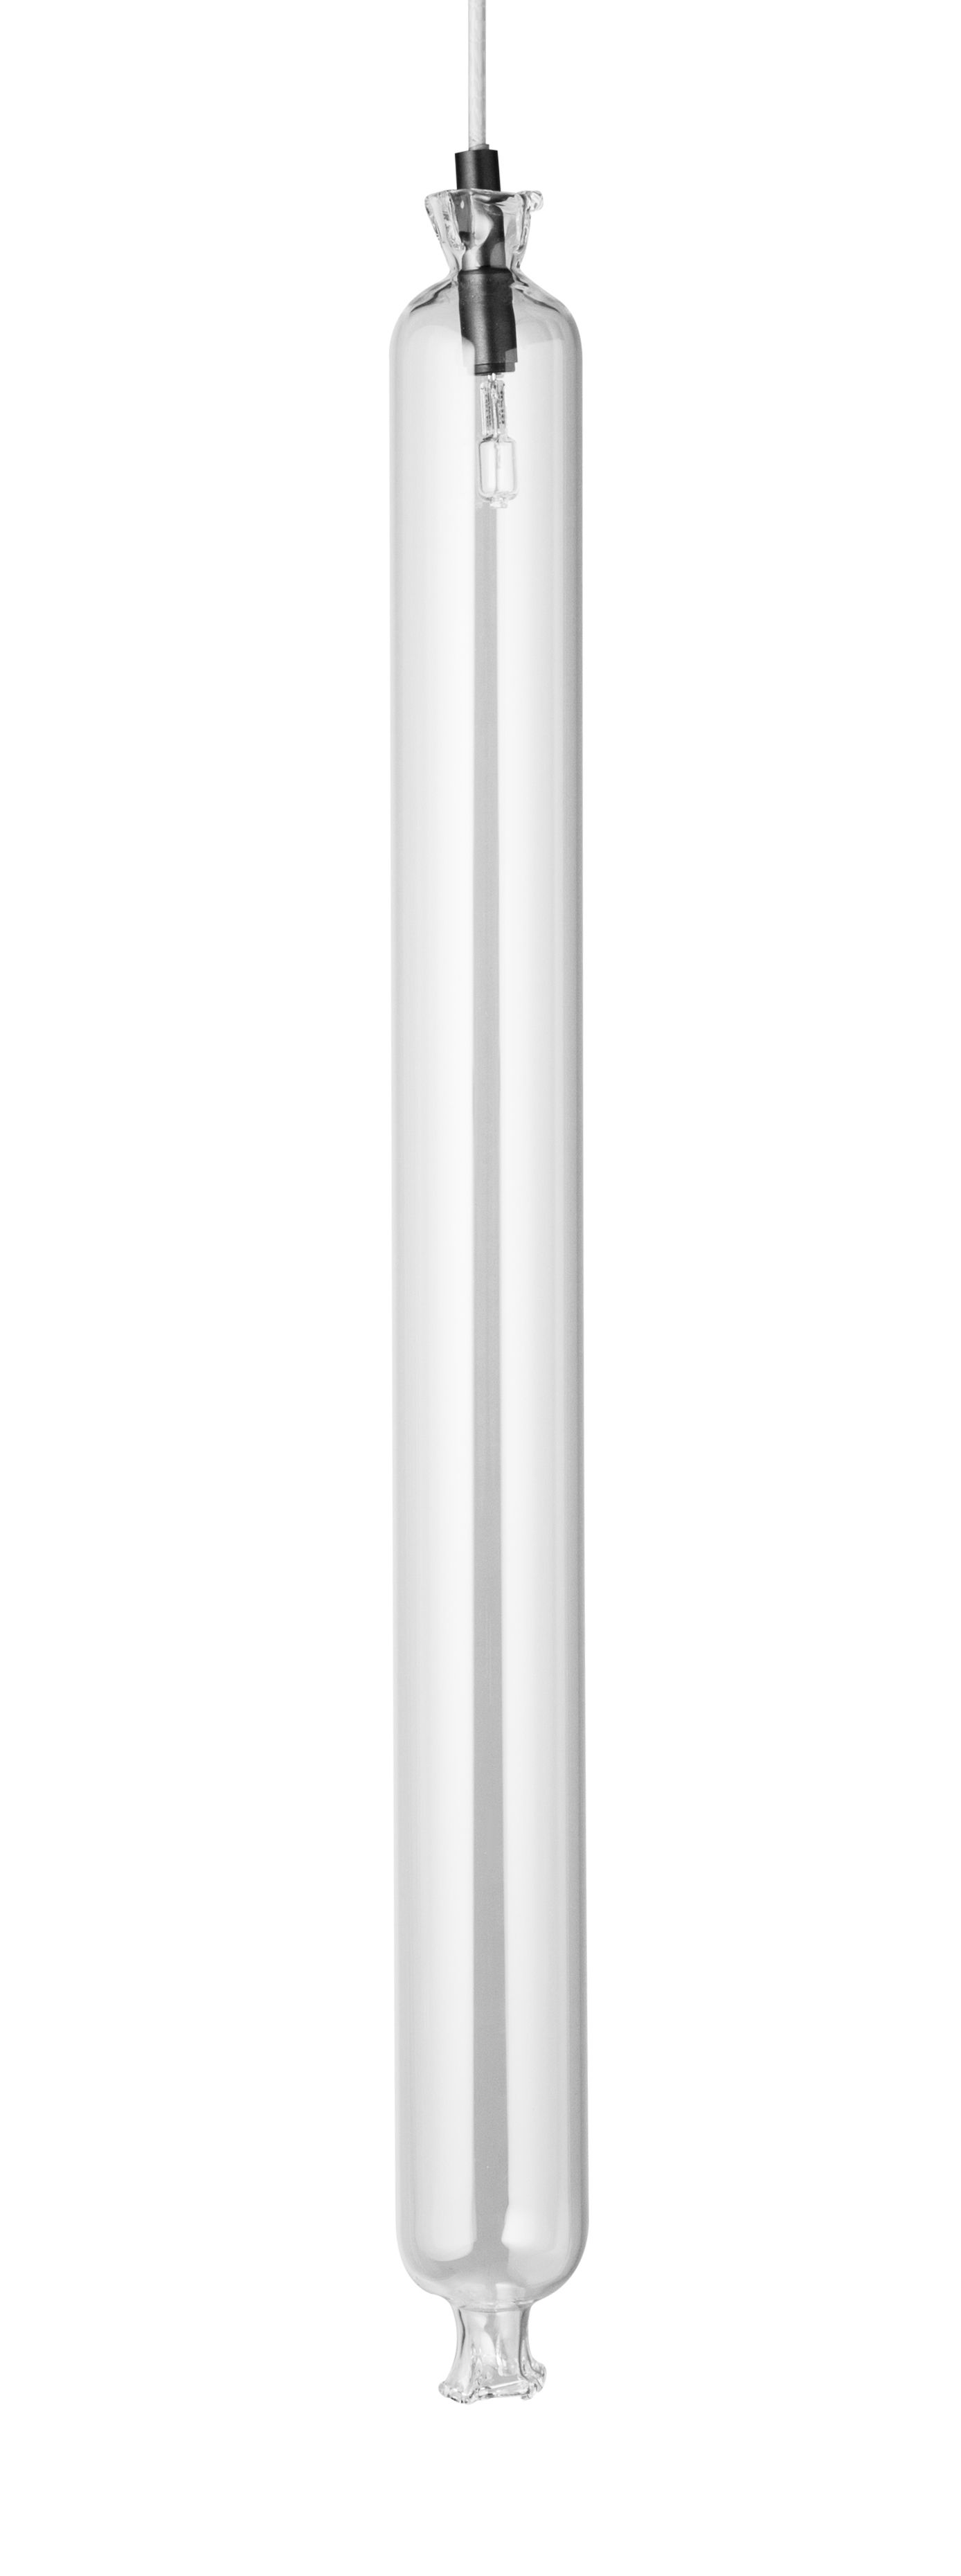 Luminaire - Suspensions - Suspension So-Sage Gendarme / H 40 cm - Petite Friture - Gendarme / Transparent - Laiton peint, Verre borosilicaté